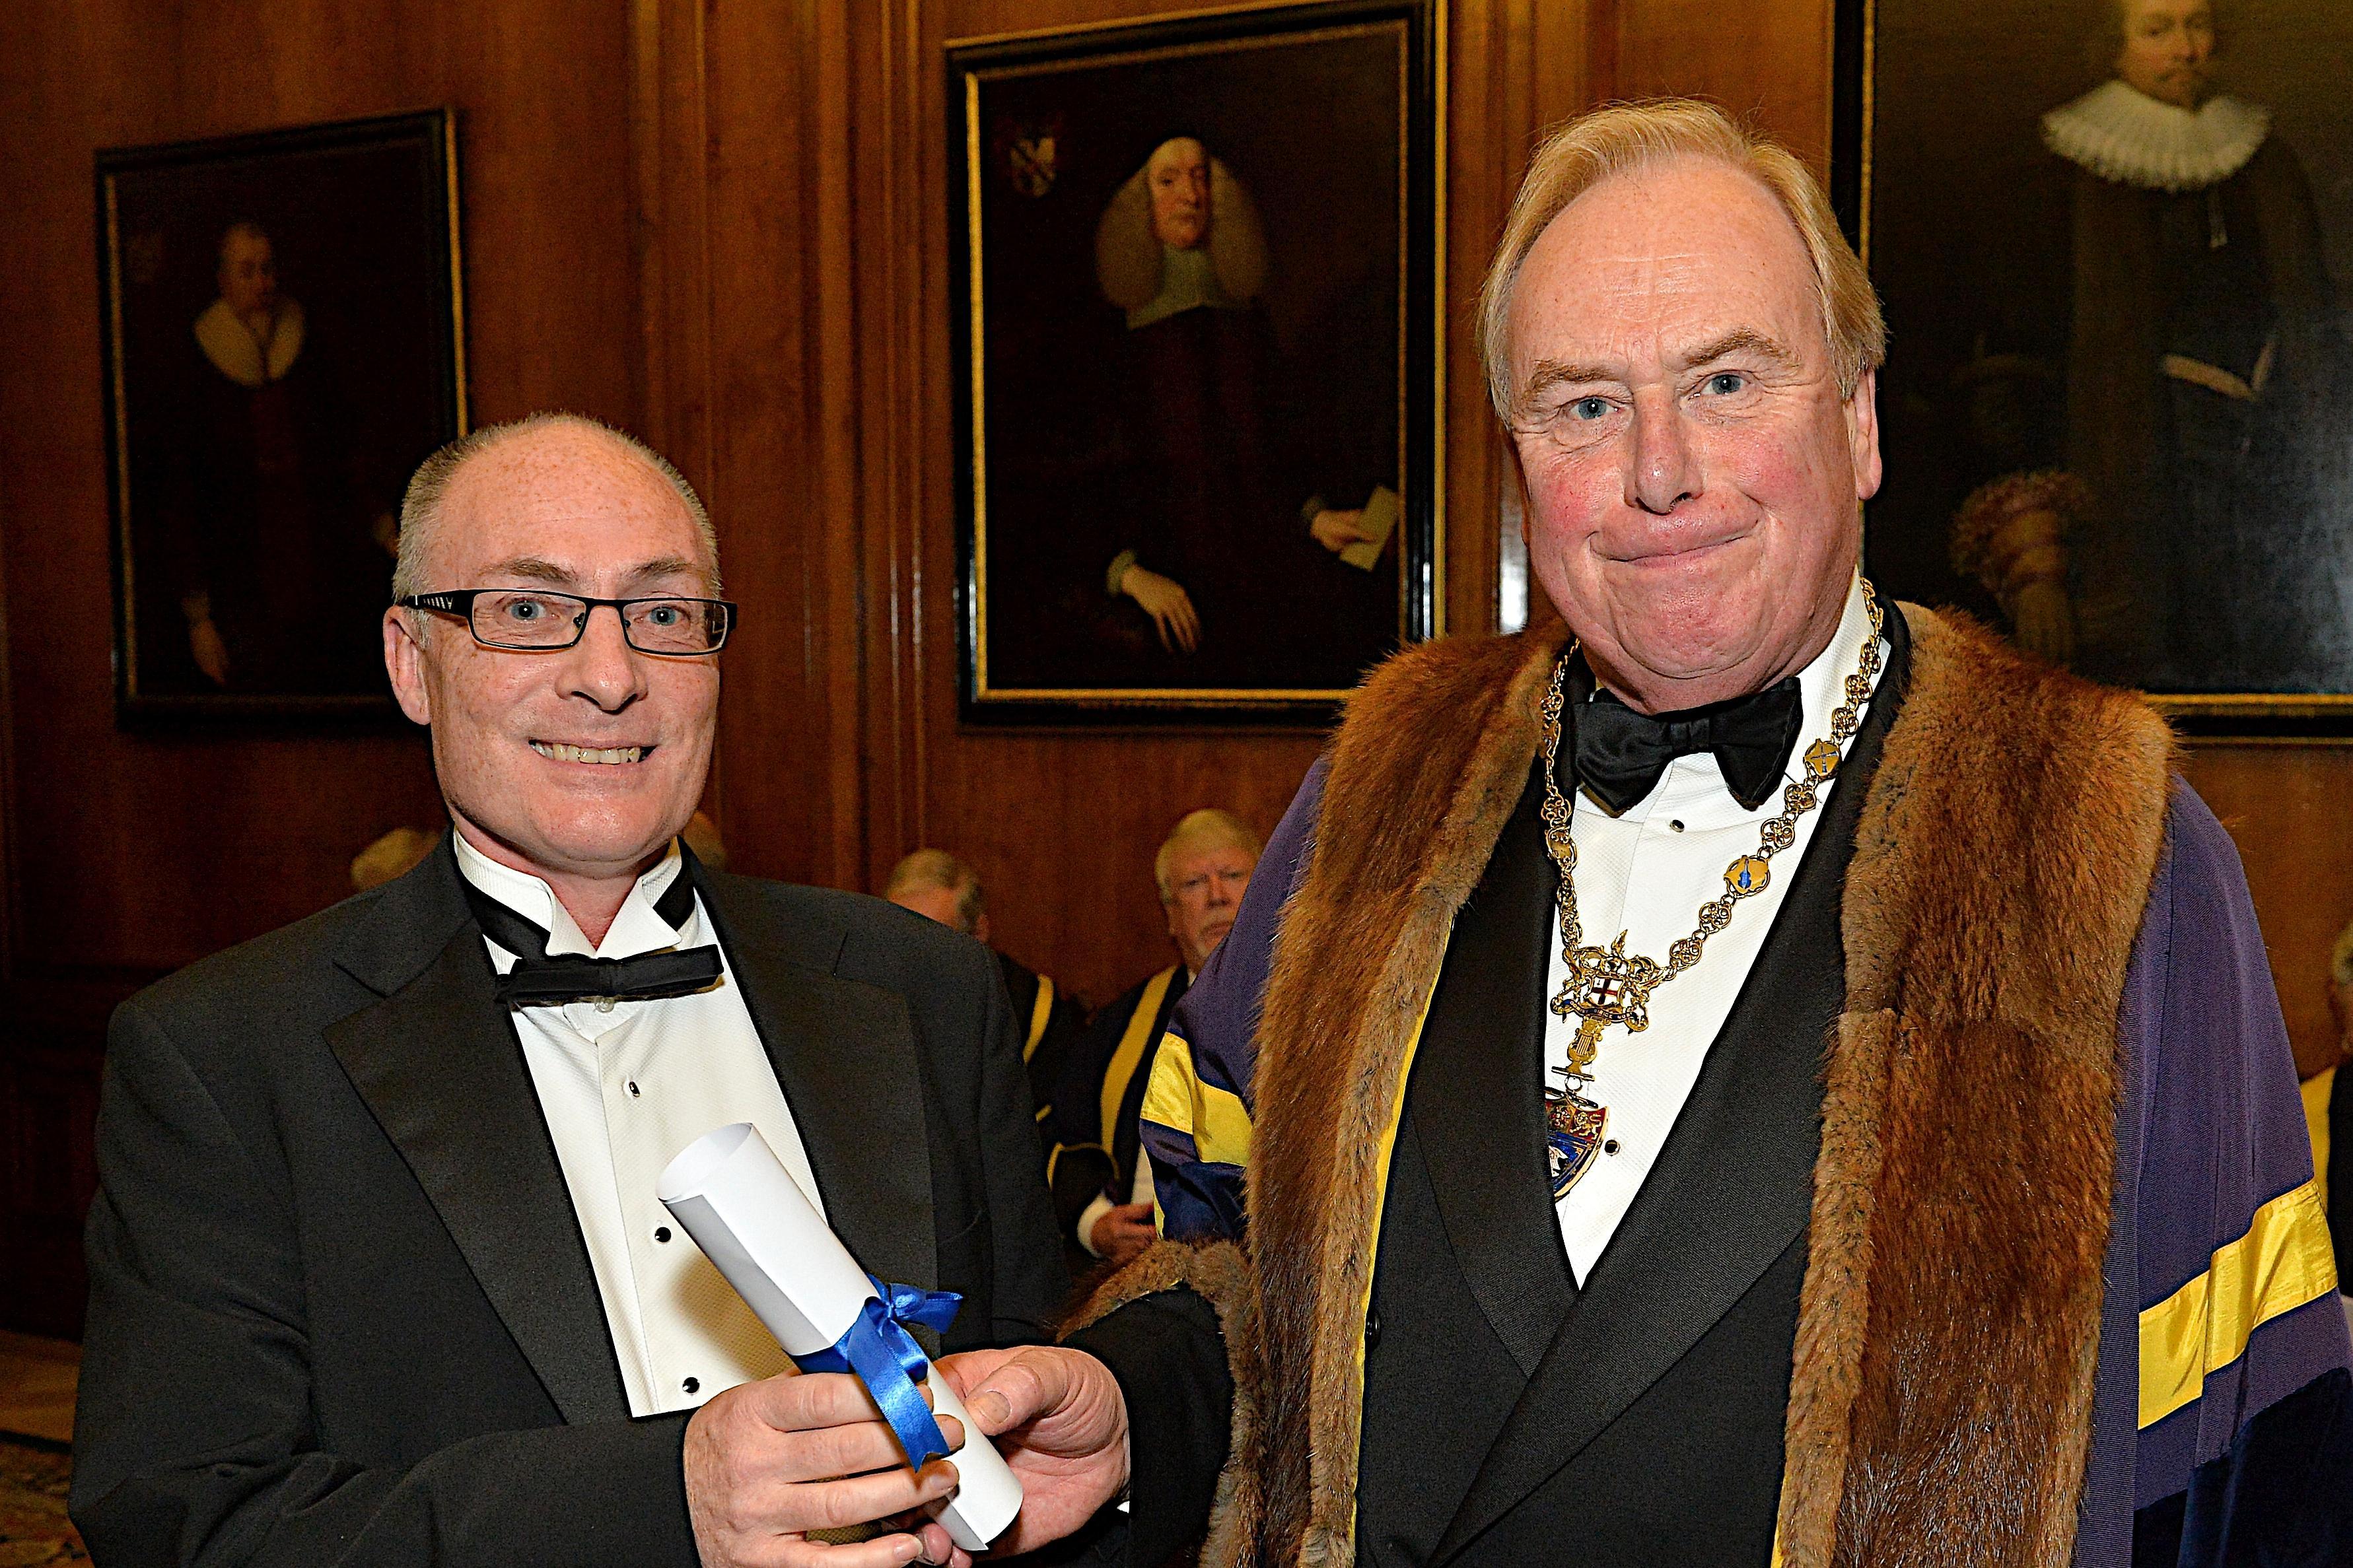 Dr James Westbrook receives the 2015 Terence Pamplin Award